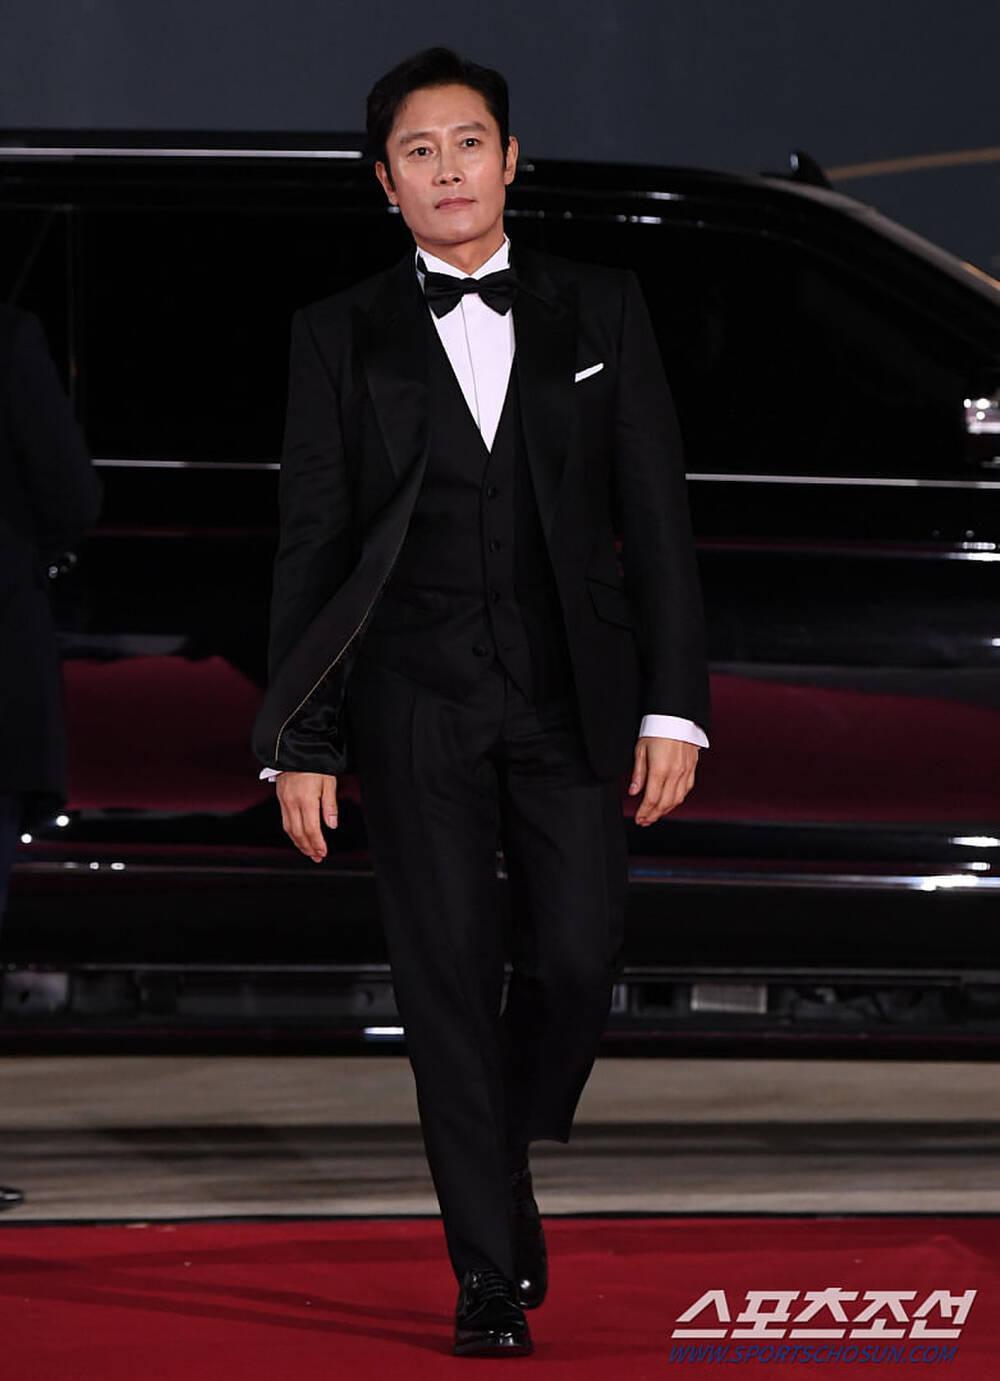 Thảm đỏ 'Rồng xanh 2020': Shin Hye Sun 'cân sắc' Shin Min Ah, Jung Woo Sung - Lee Byung Hun điển trai! Ảnh 27